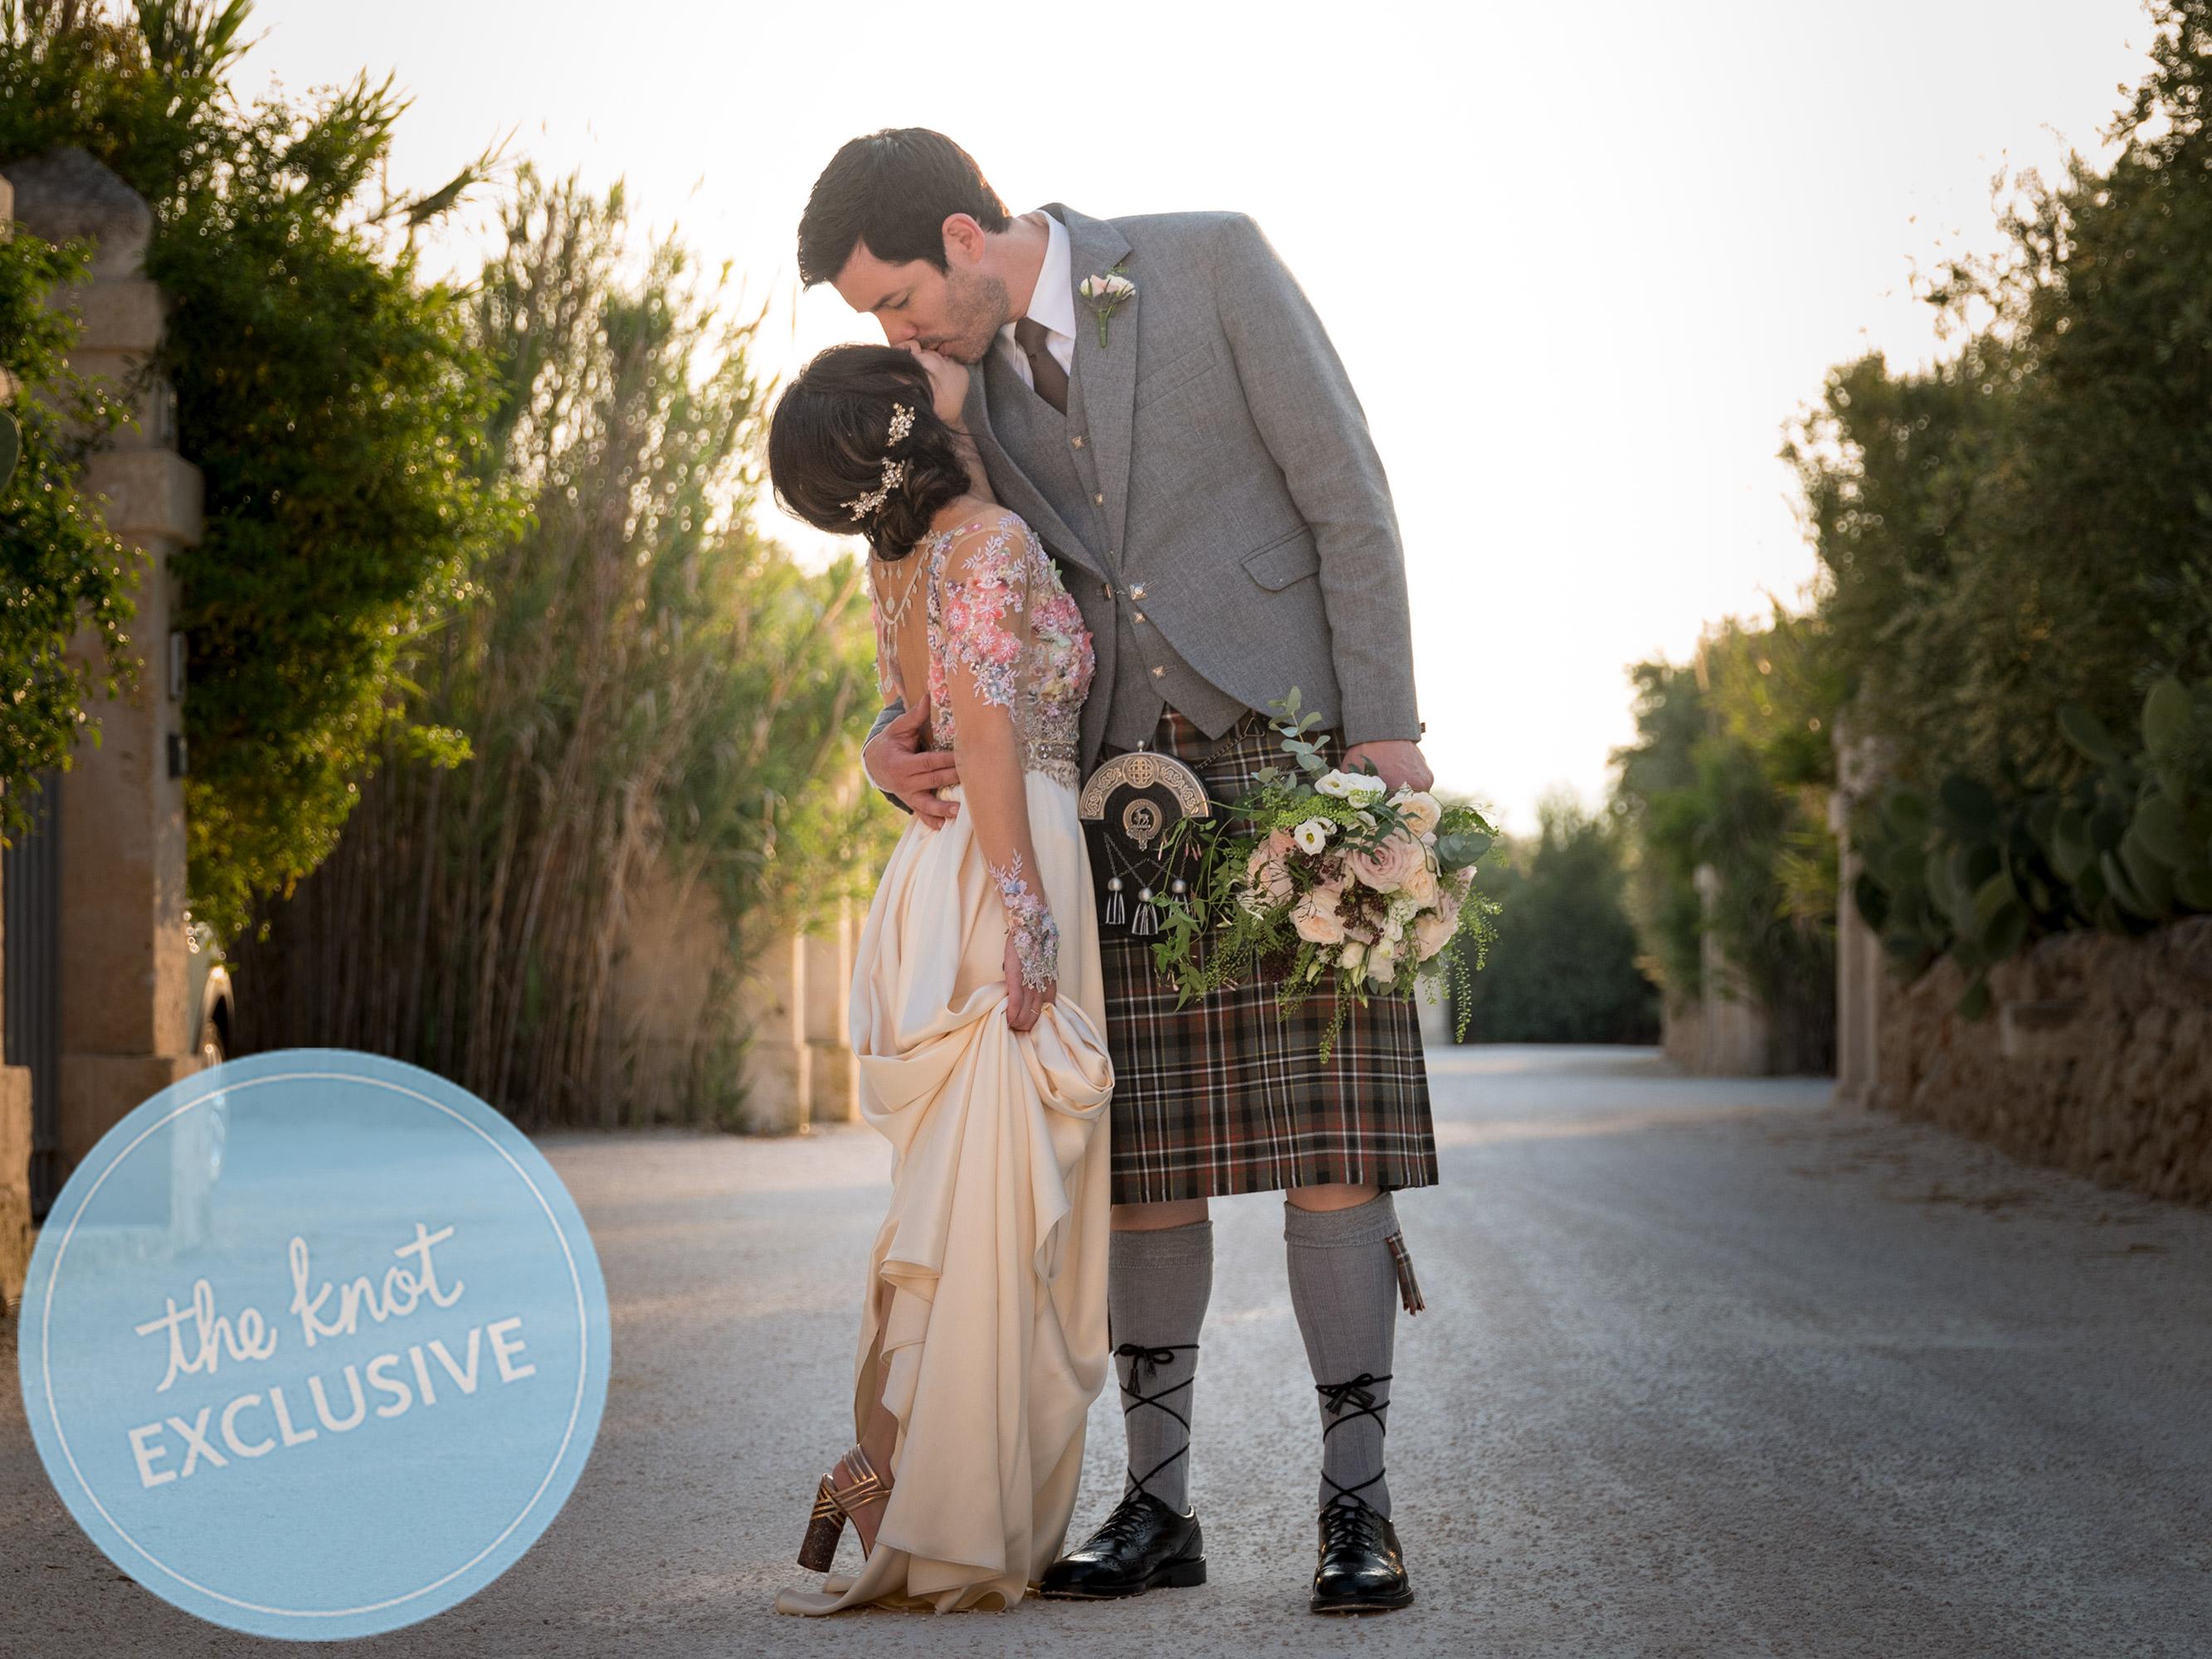 Drew Scott Wedding Date.Exclusive Drew Scott And Linda Phan S Very Personal Italian